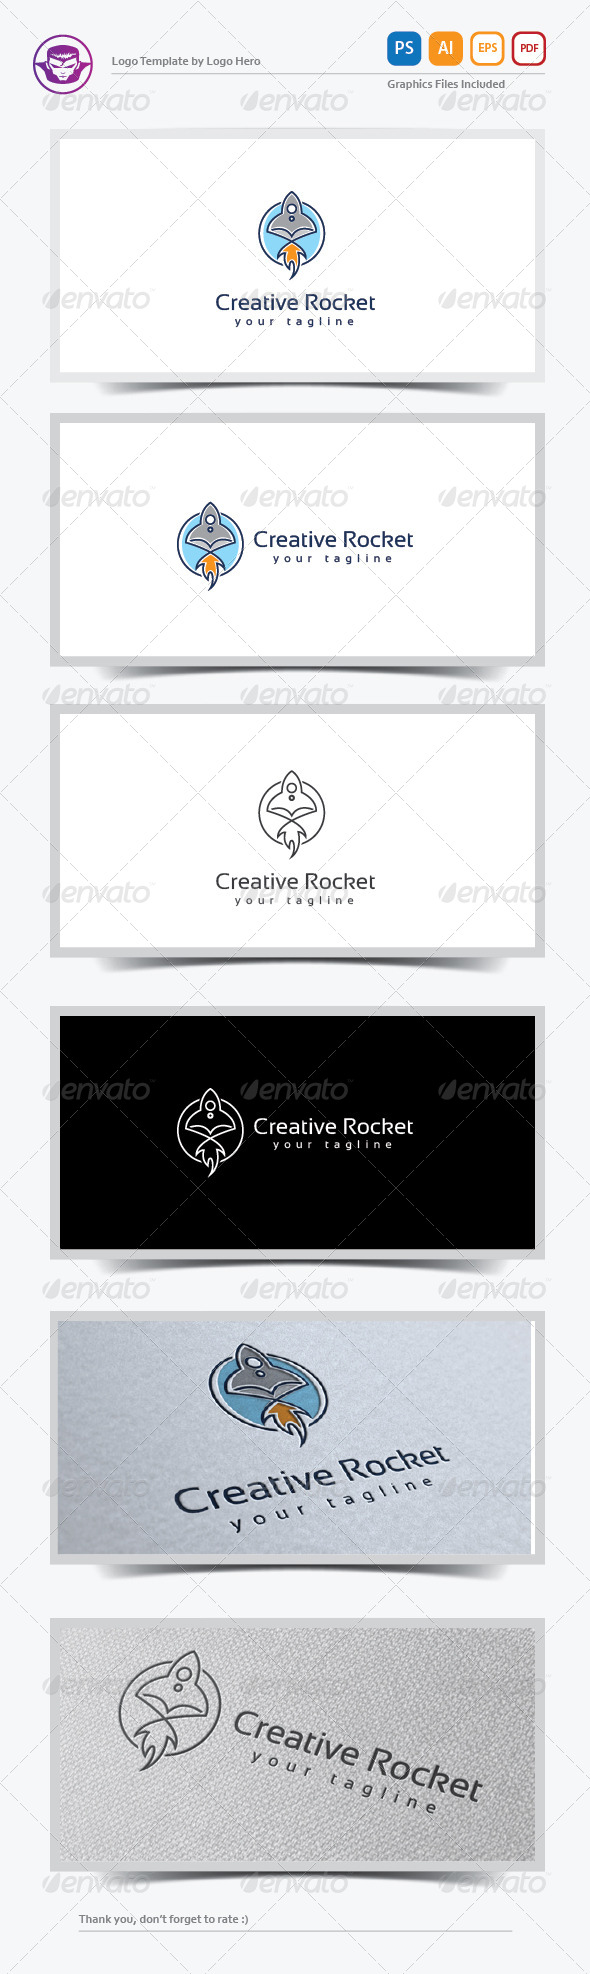 GraphicRiver Creative Rocket Logo Template 8151382